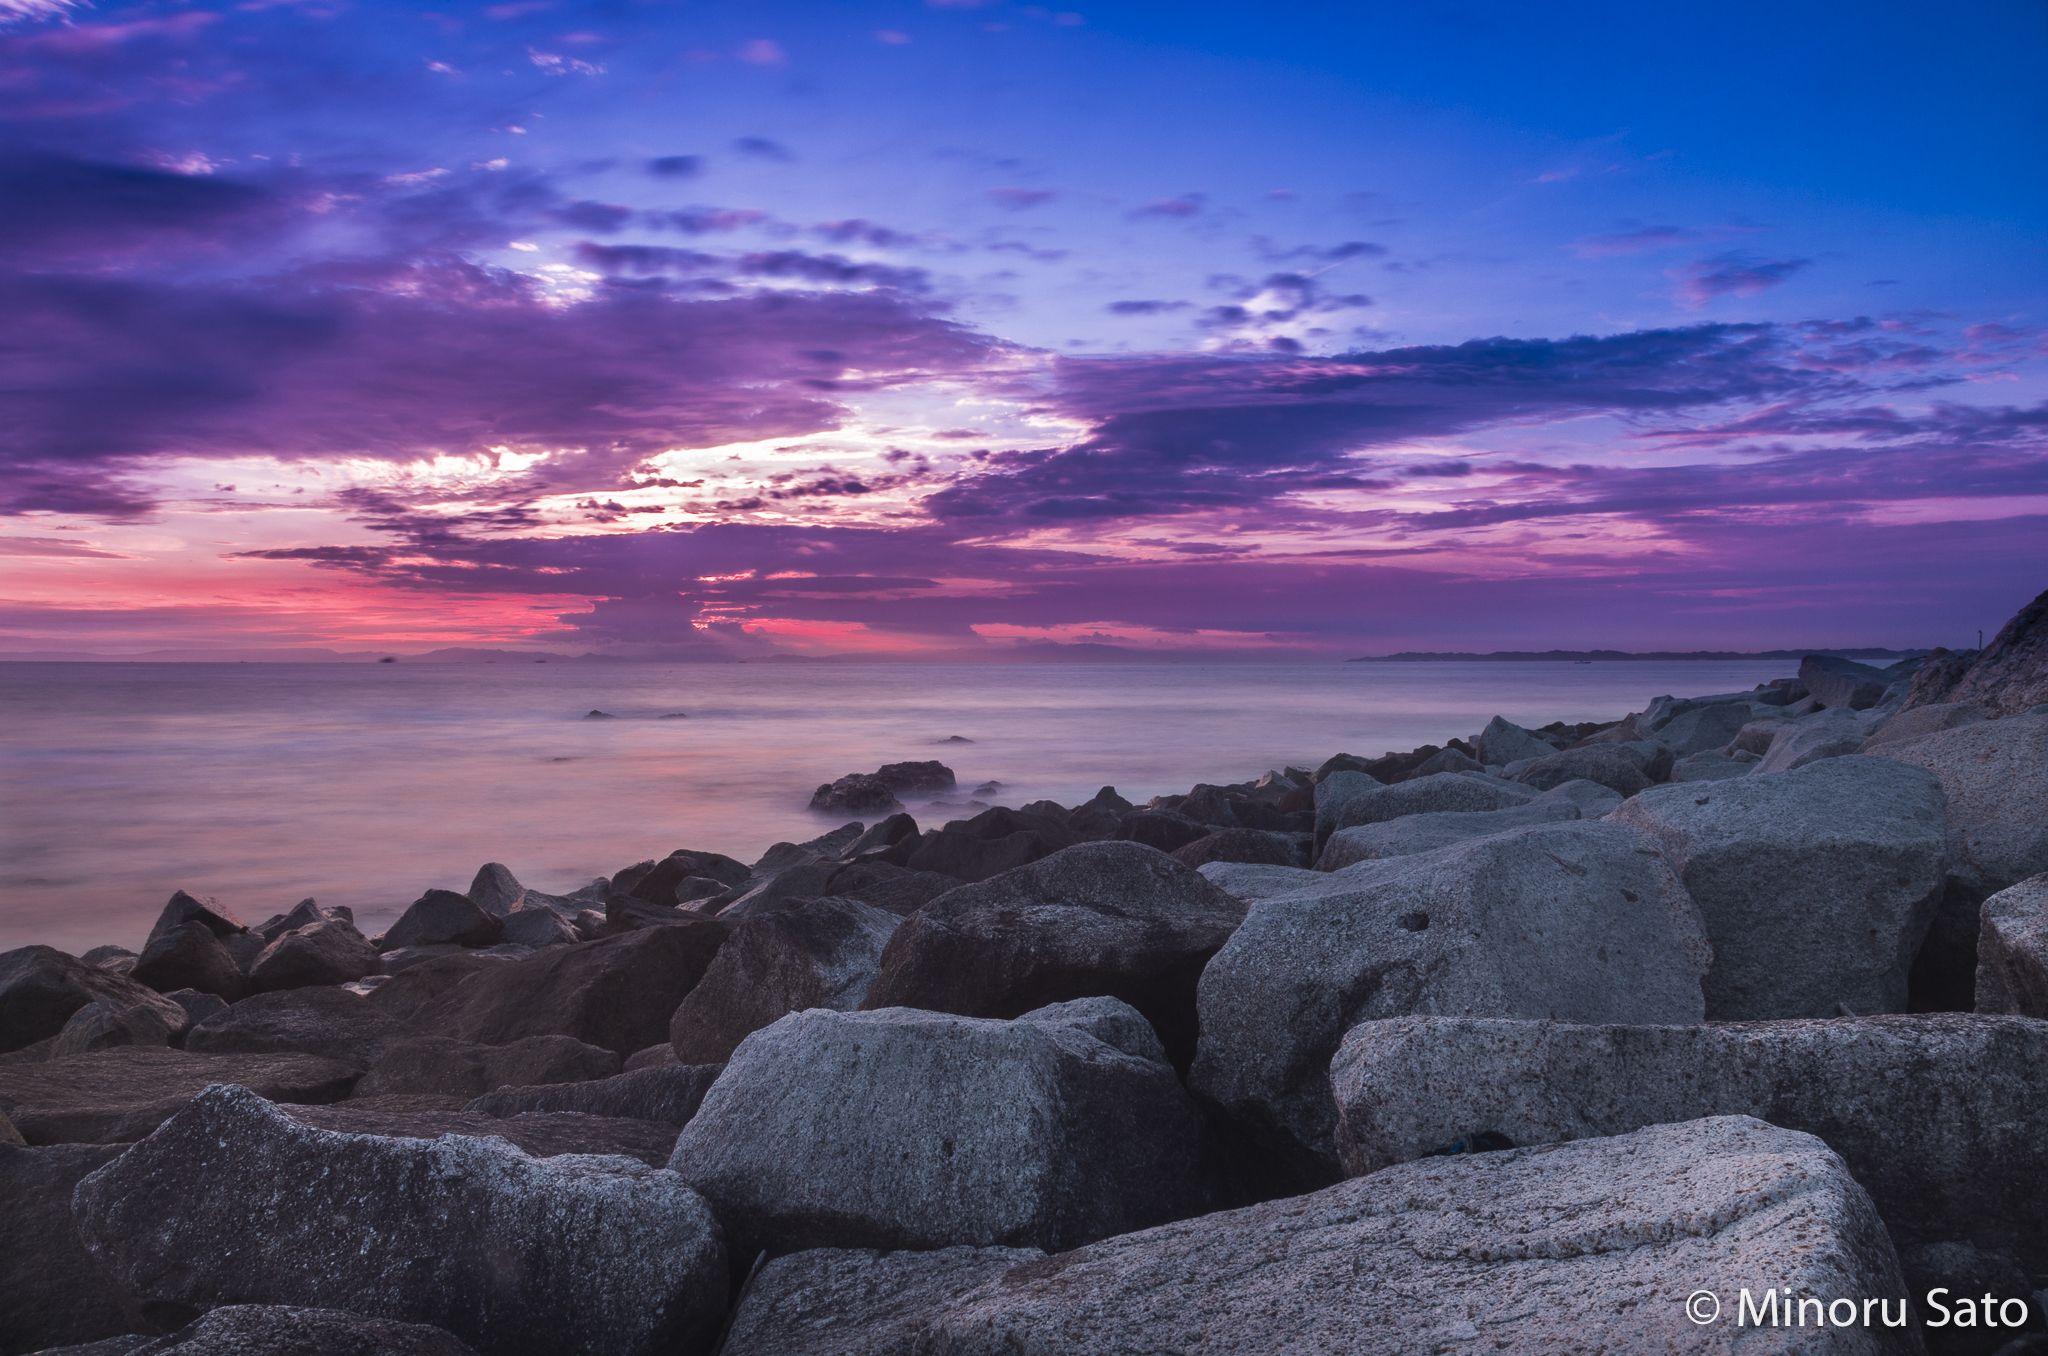 sunset blue sky by Minoru Sato